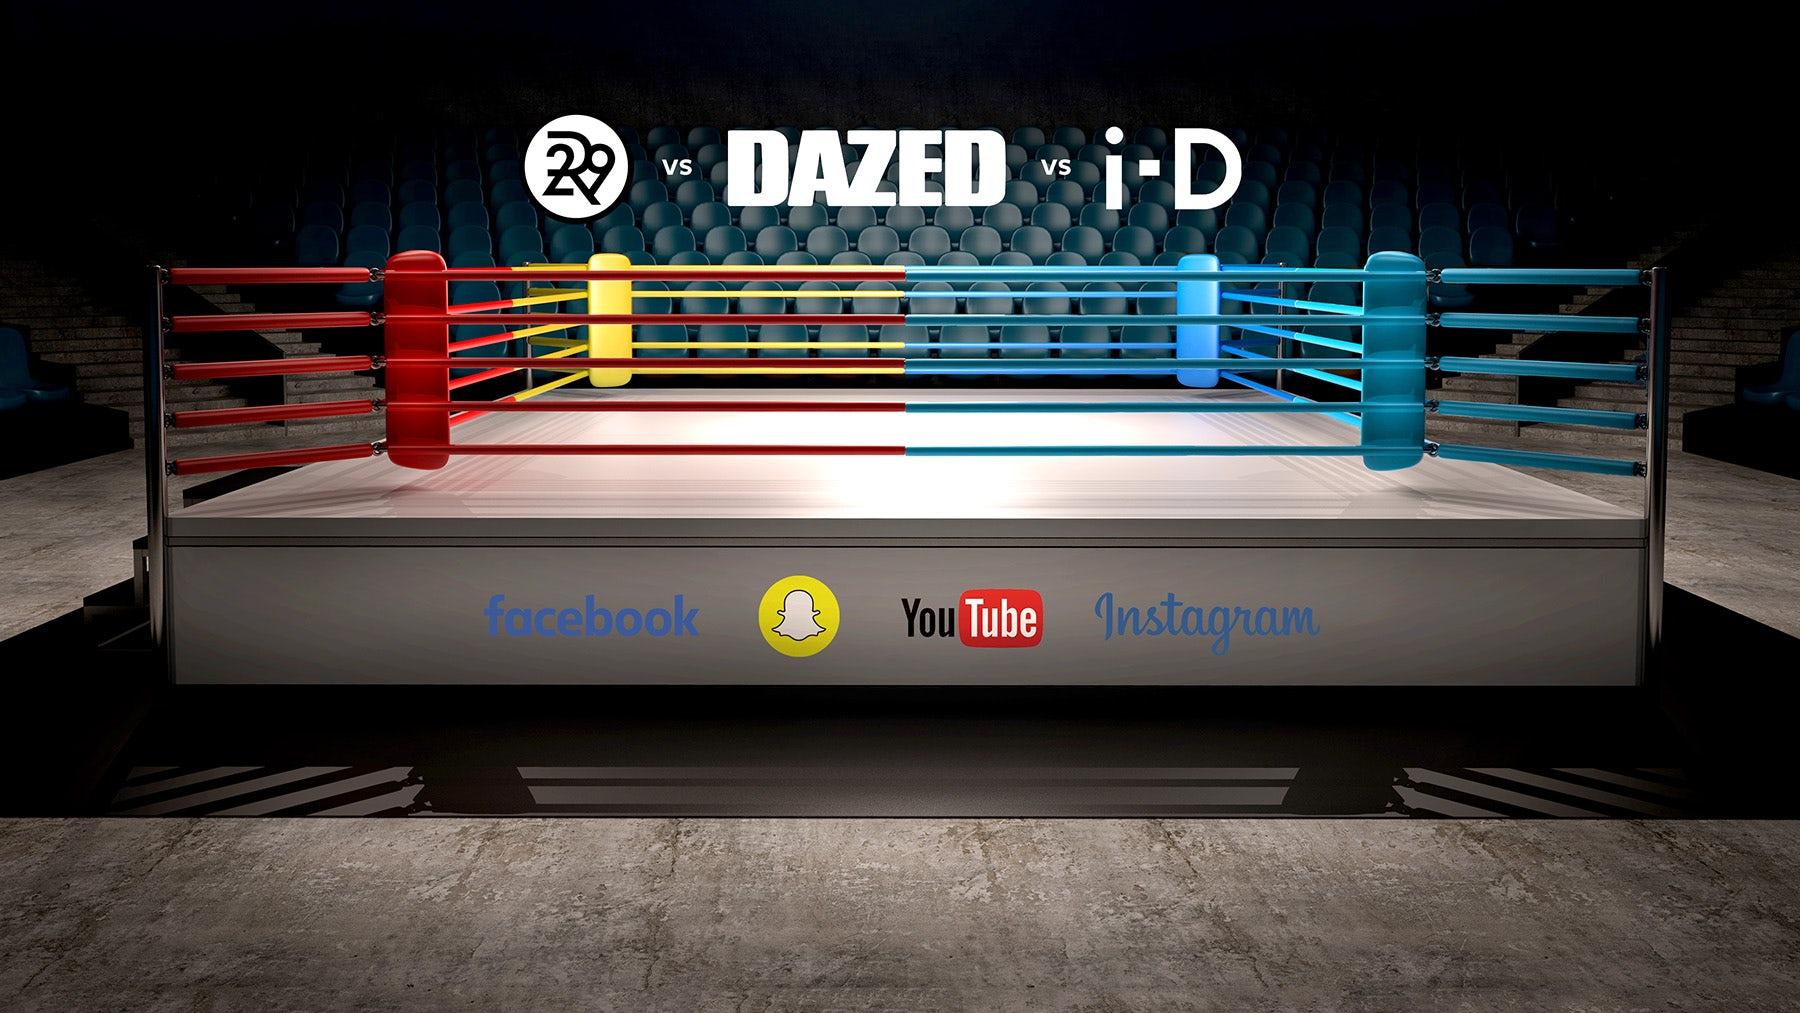 Refinery29, Dazed and i-D Battle for Millennials